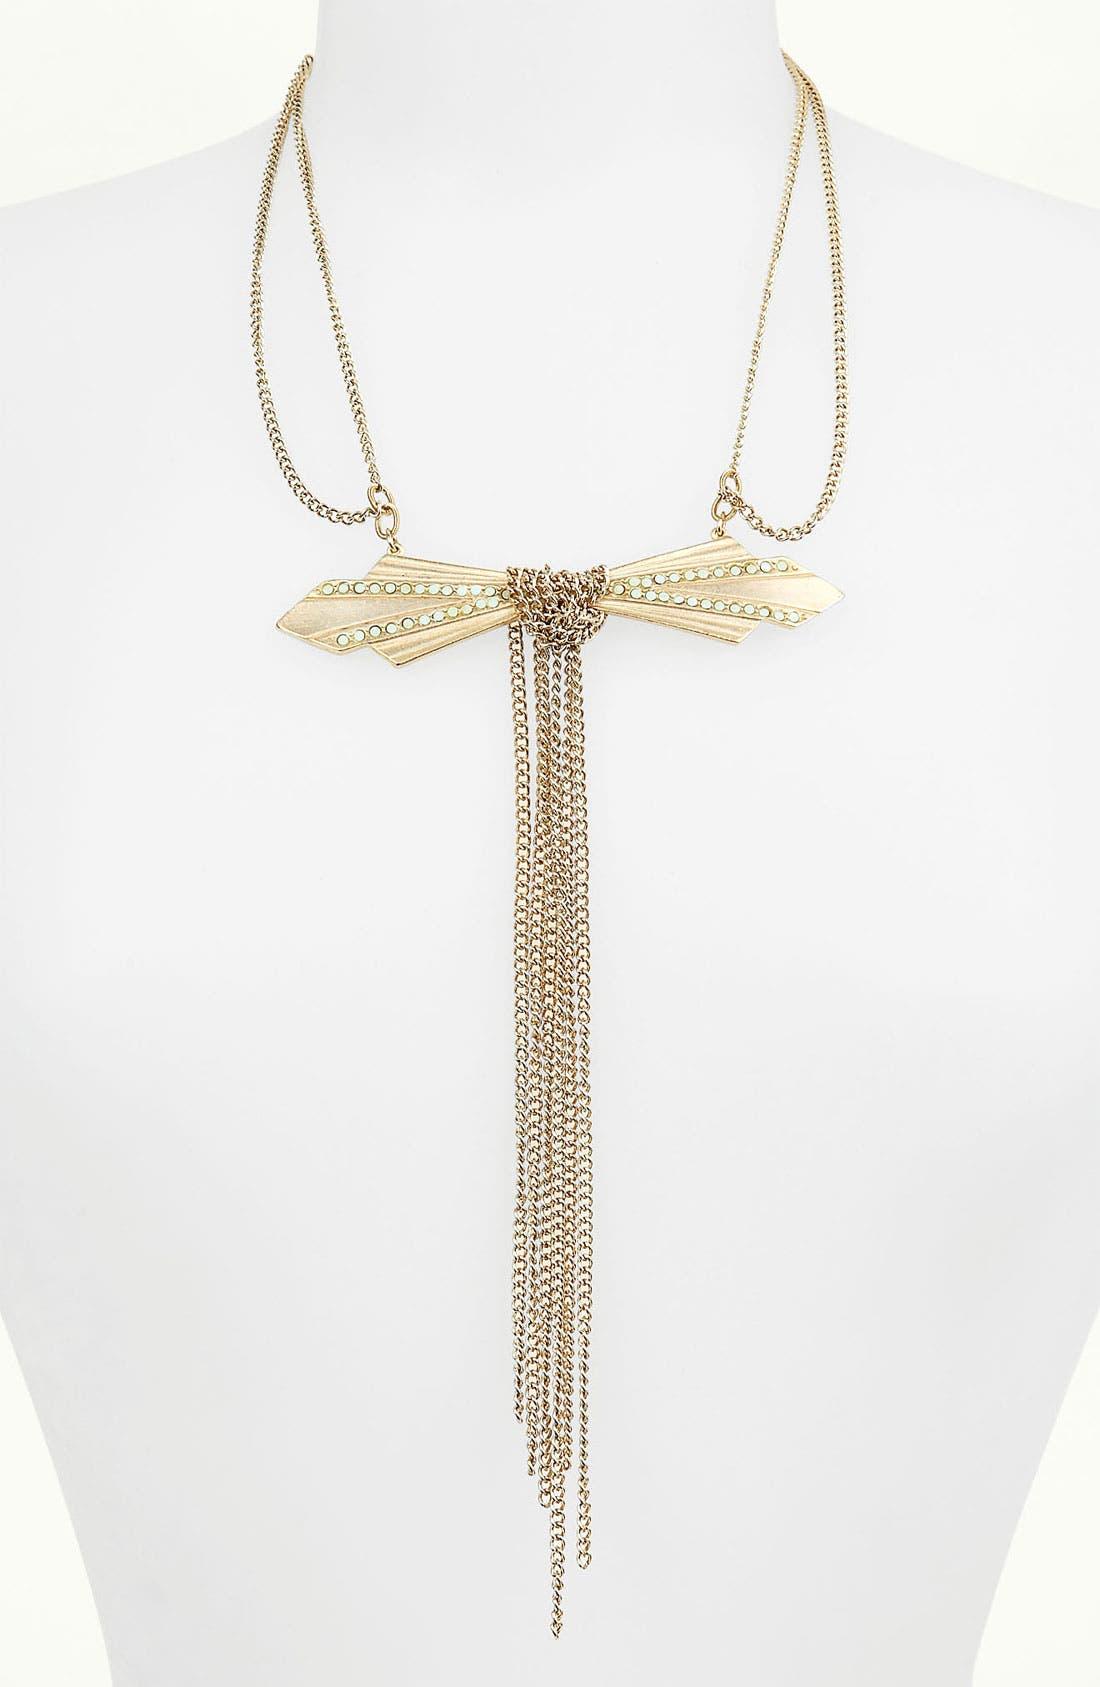 Main Image - Bonnie Jonas 'Deco Bow' Necklace